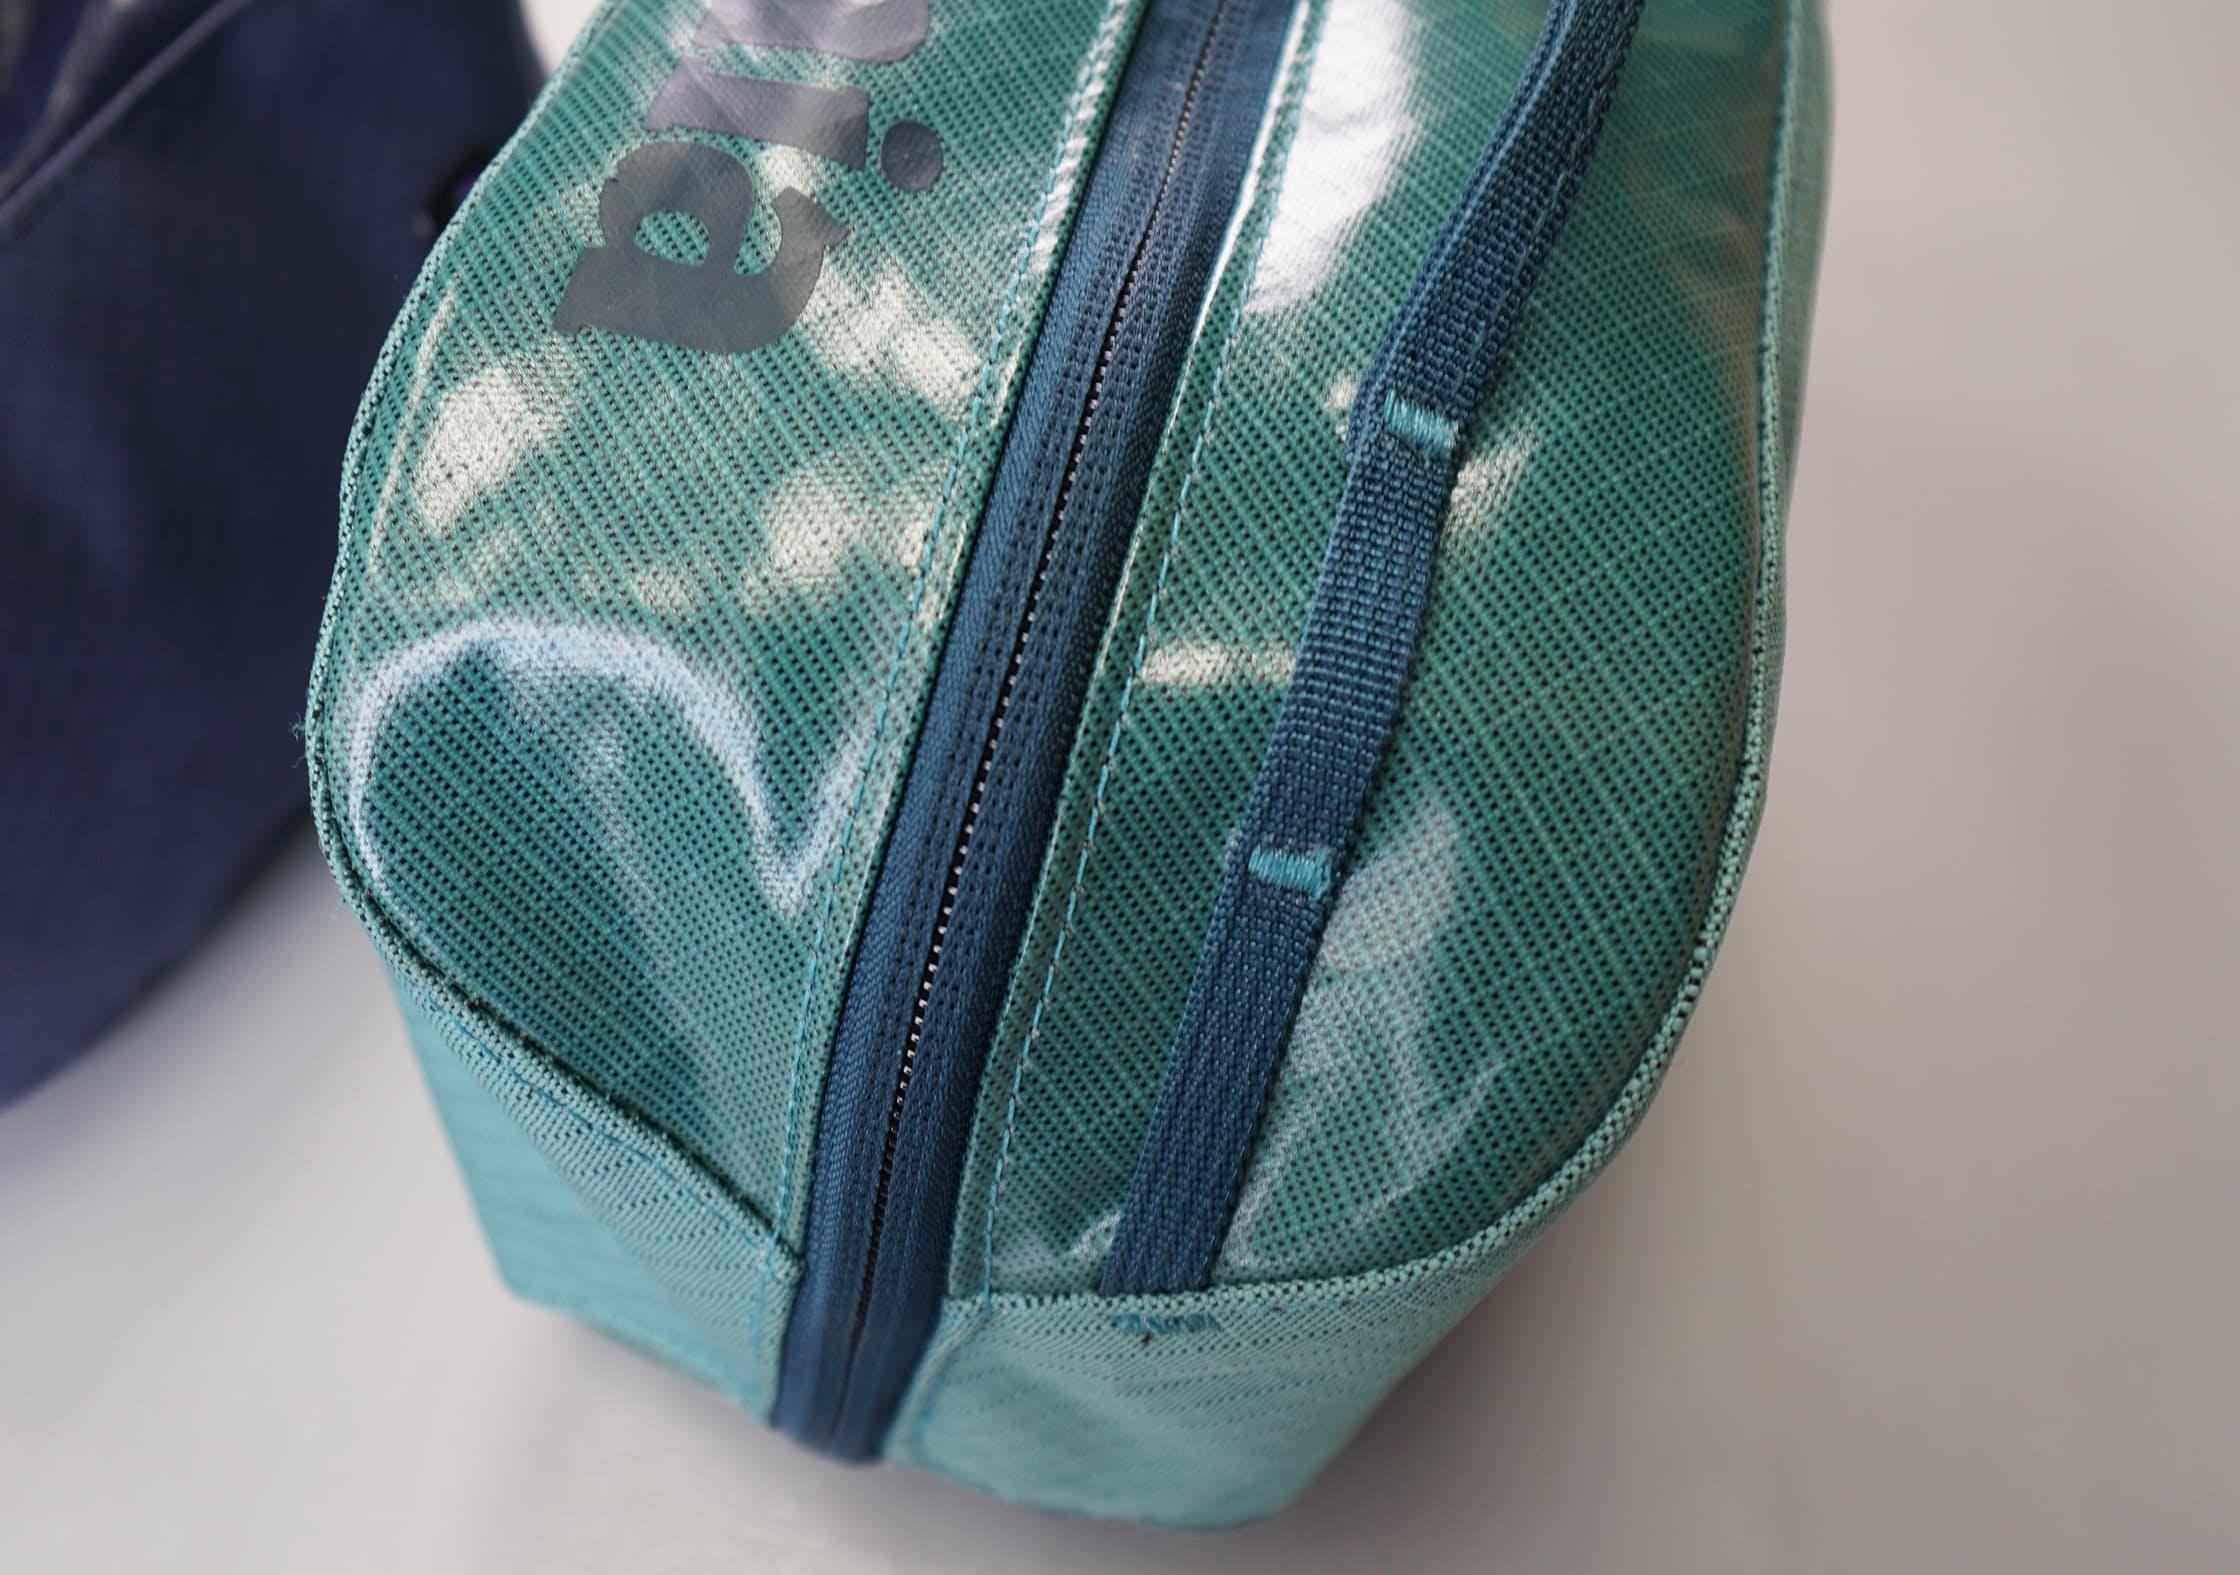 Patagonia Black Hole Cube Daisy Chain & Fabric Detail